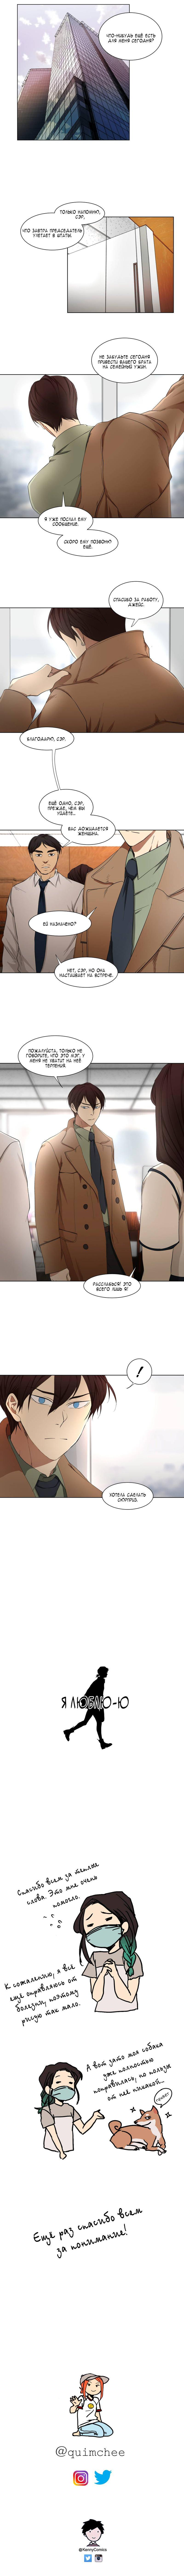 Манга Я люблю Ю / I love Yoo  - Том 1 Глава 20 Страница 5